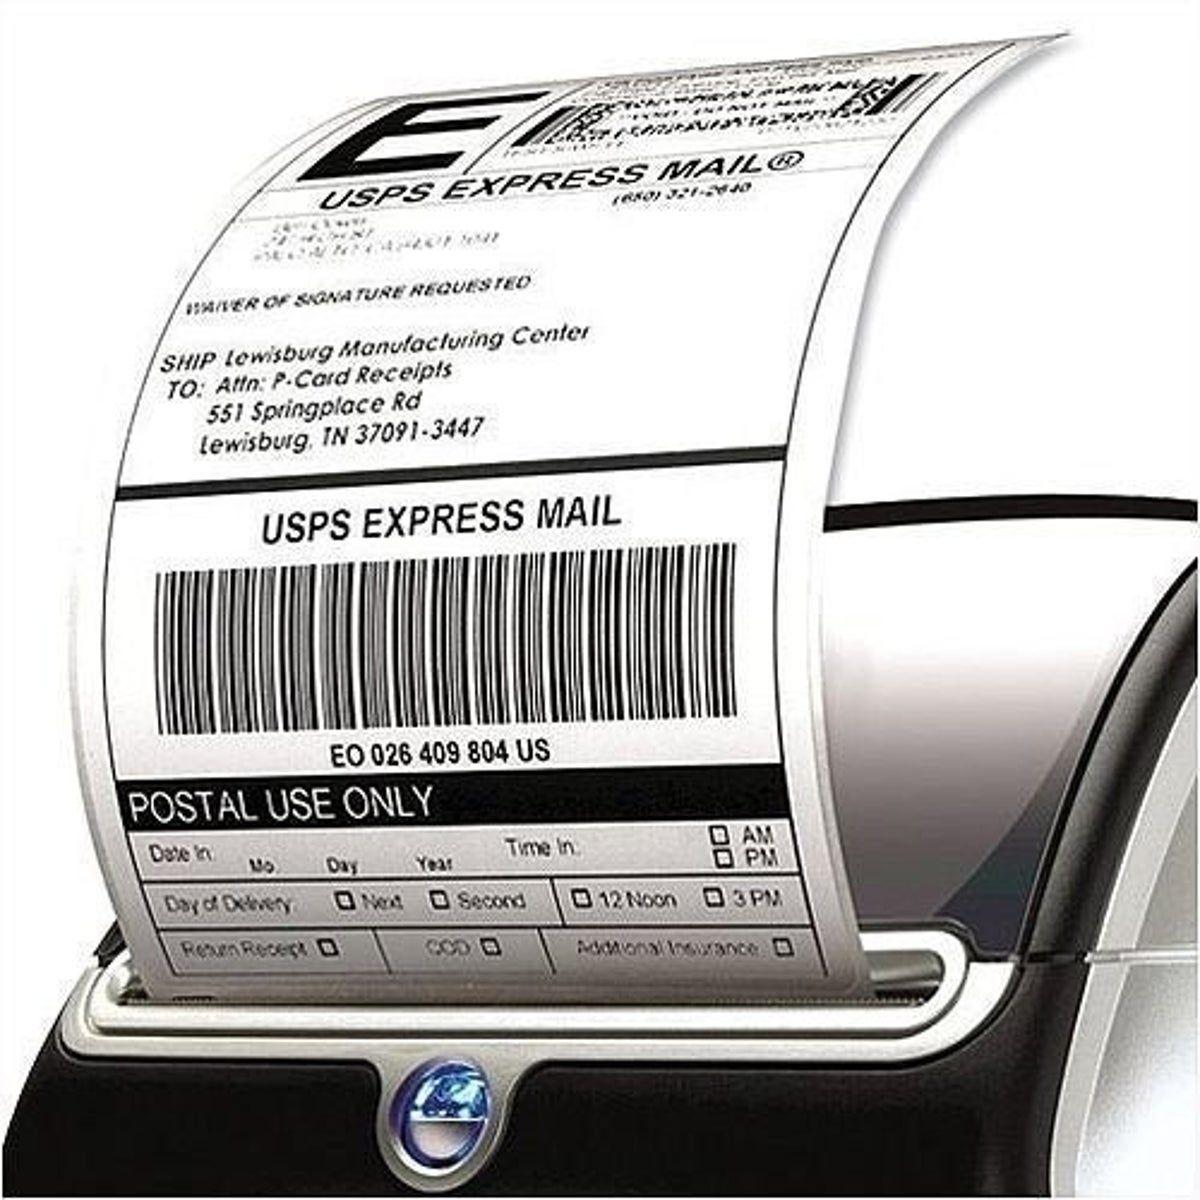 Dymo Label Printer Writer 4xl Thermal Label Printer Dymo Label Label Software